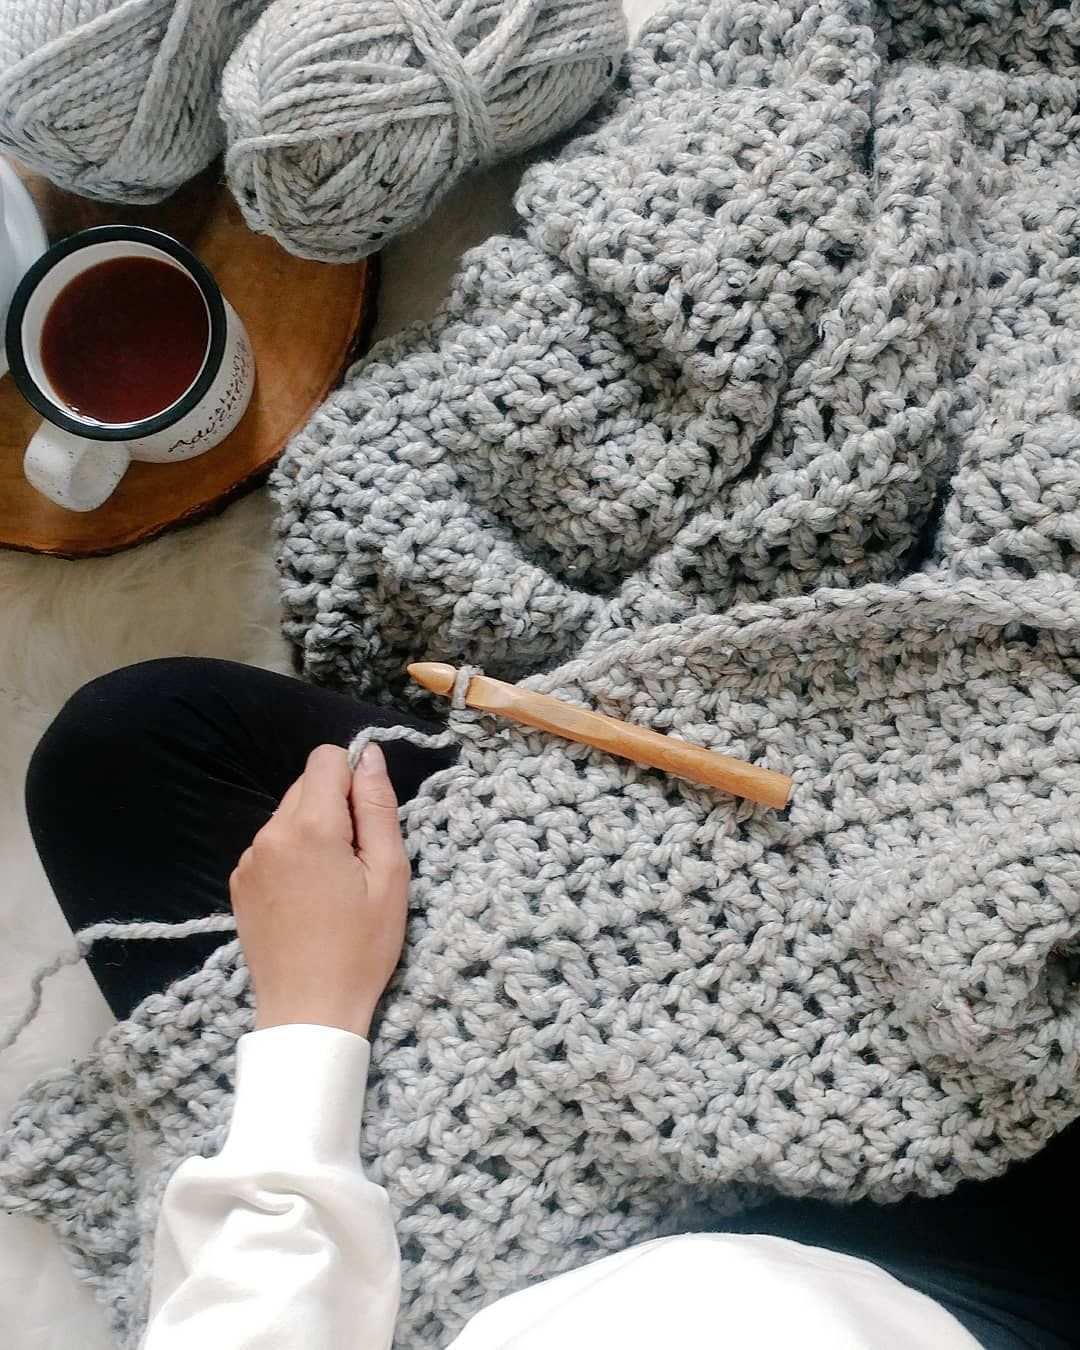 32 Beautiful Image Of Super Chunky Crochet Blanket Pattern Trendcrochets Com Crochet Blanket Pattern Easy Chunky Crochet Blanket Pattern Chunky Crochet Blanket Pattern Free